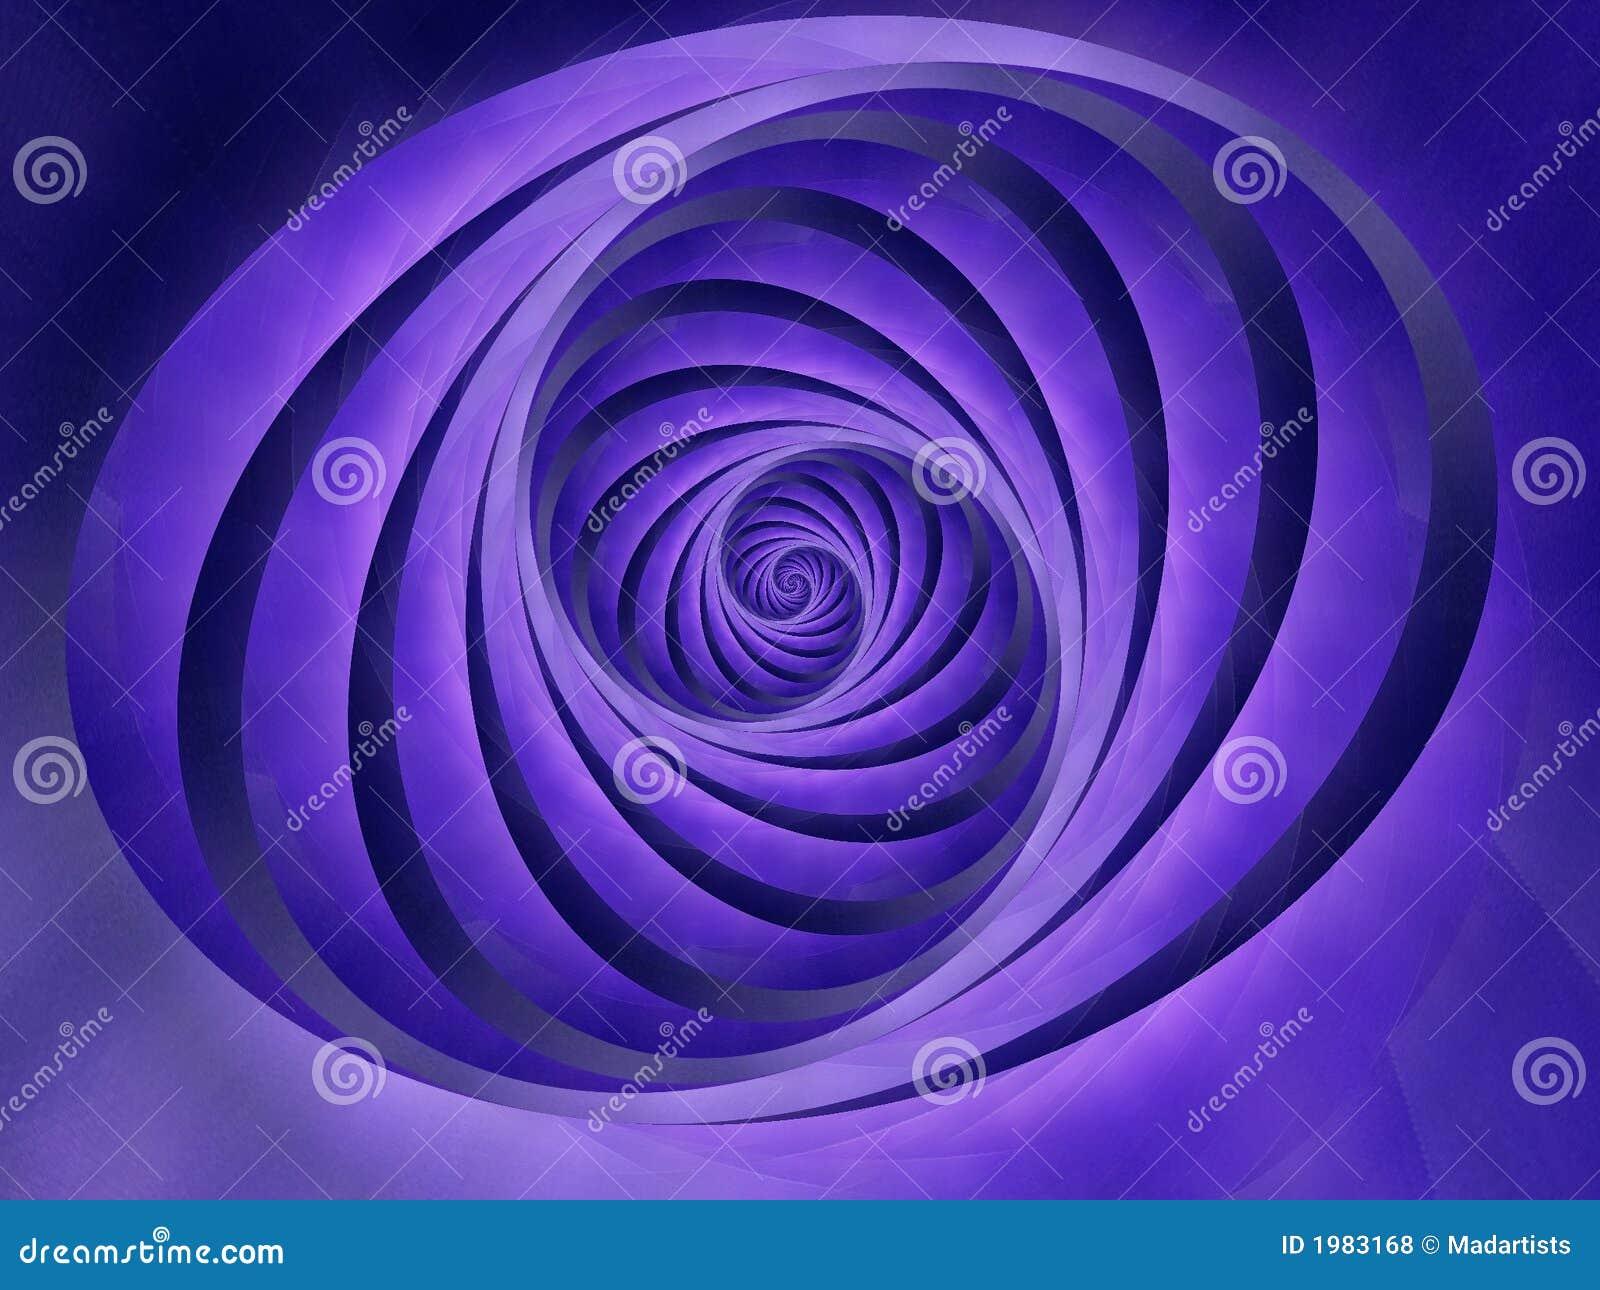 Oval Swirls Stripes Blue Color